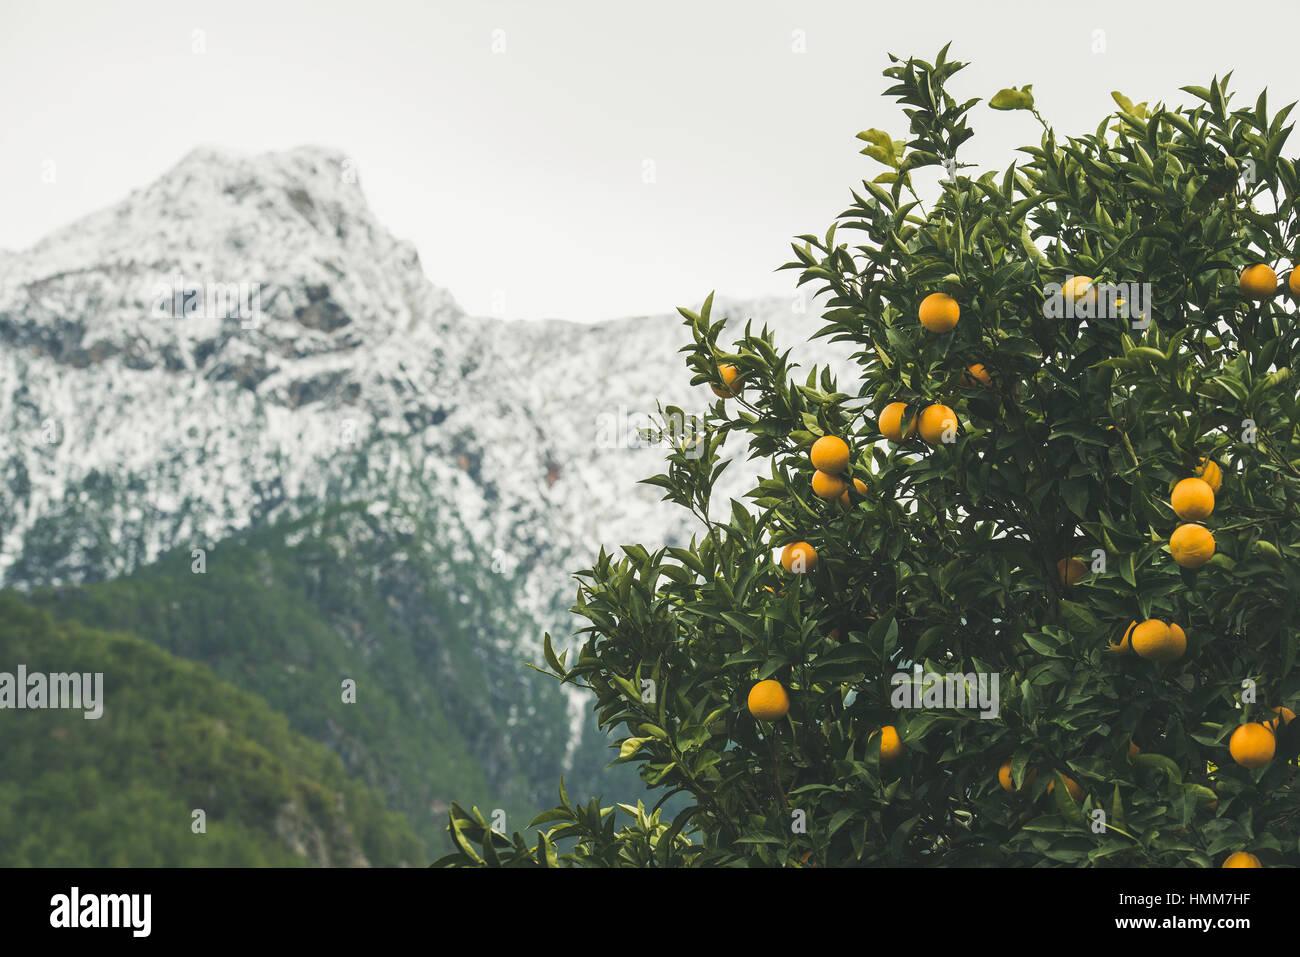 Orange trees with ripe oranges in mountain garden, Alanya, Turkey - Stock Image